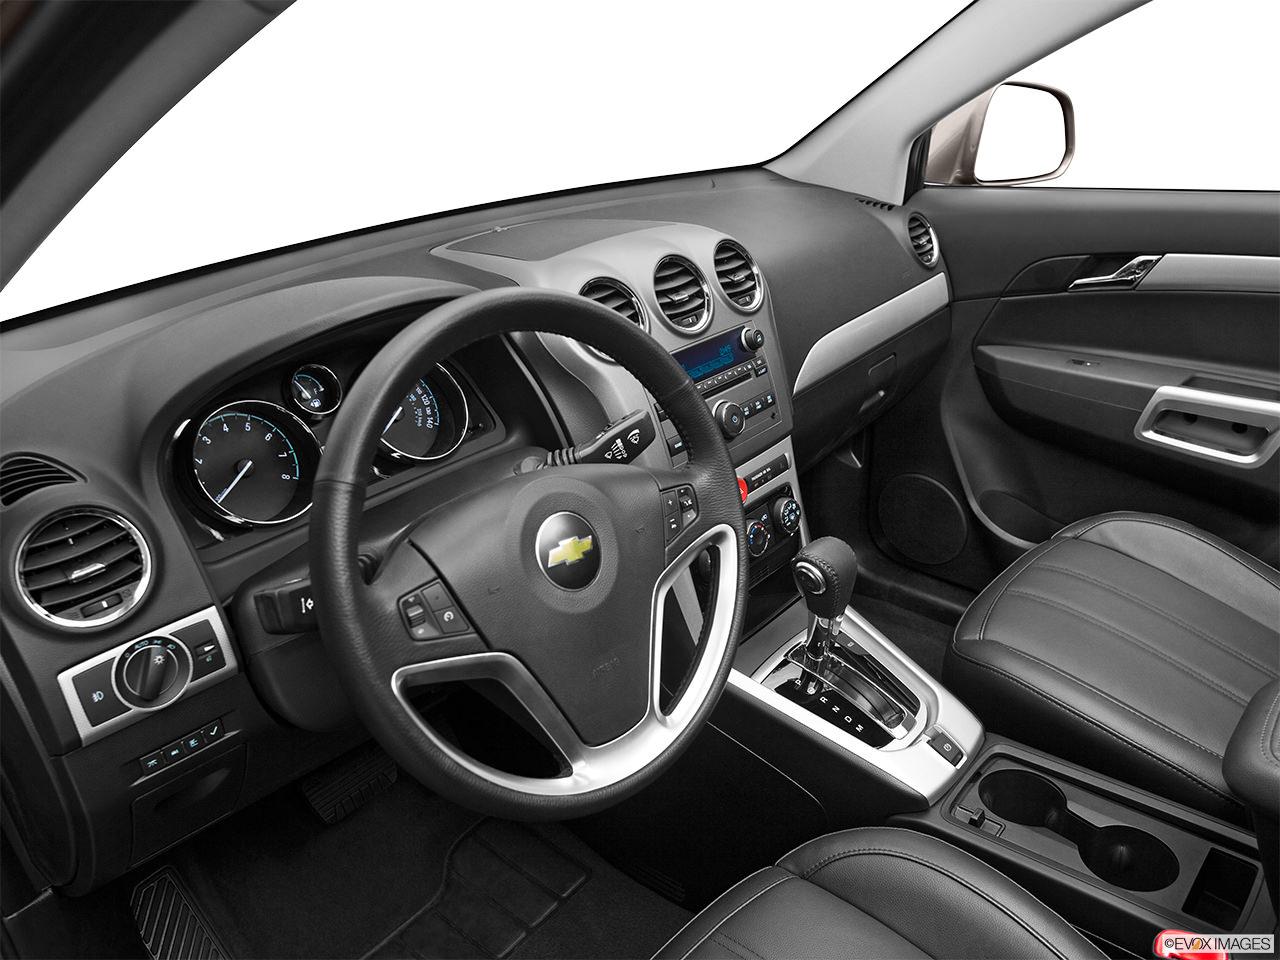 Chevrolet Captiva Sport 2012 Interior